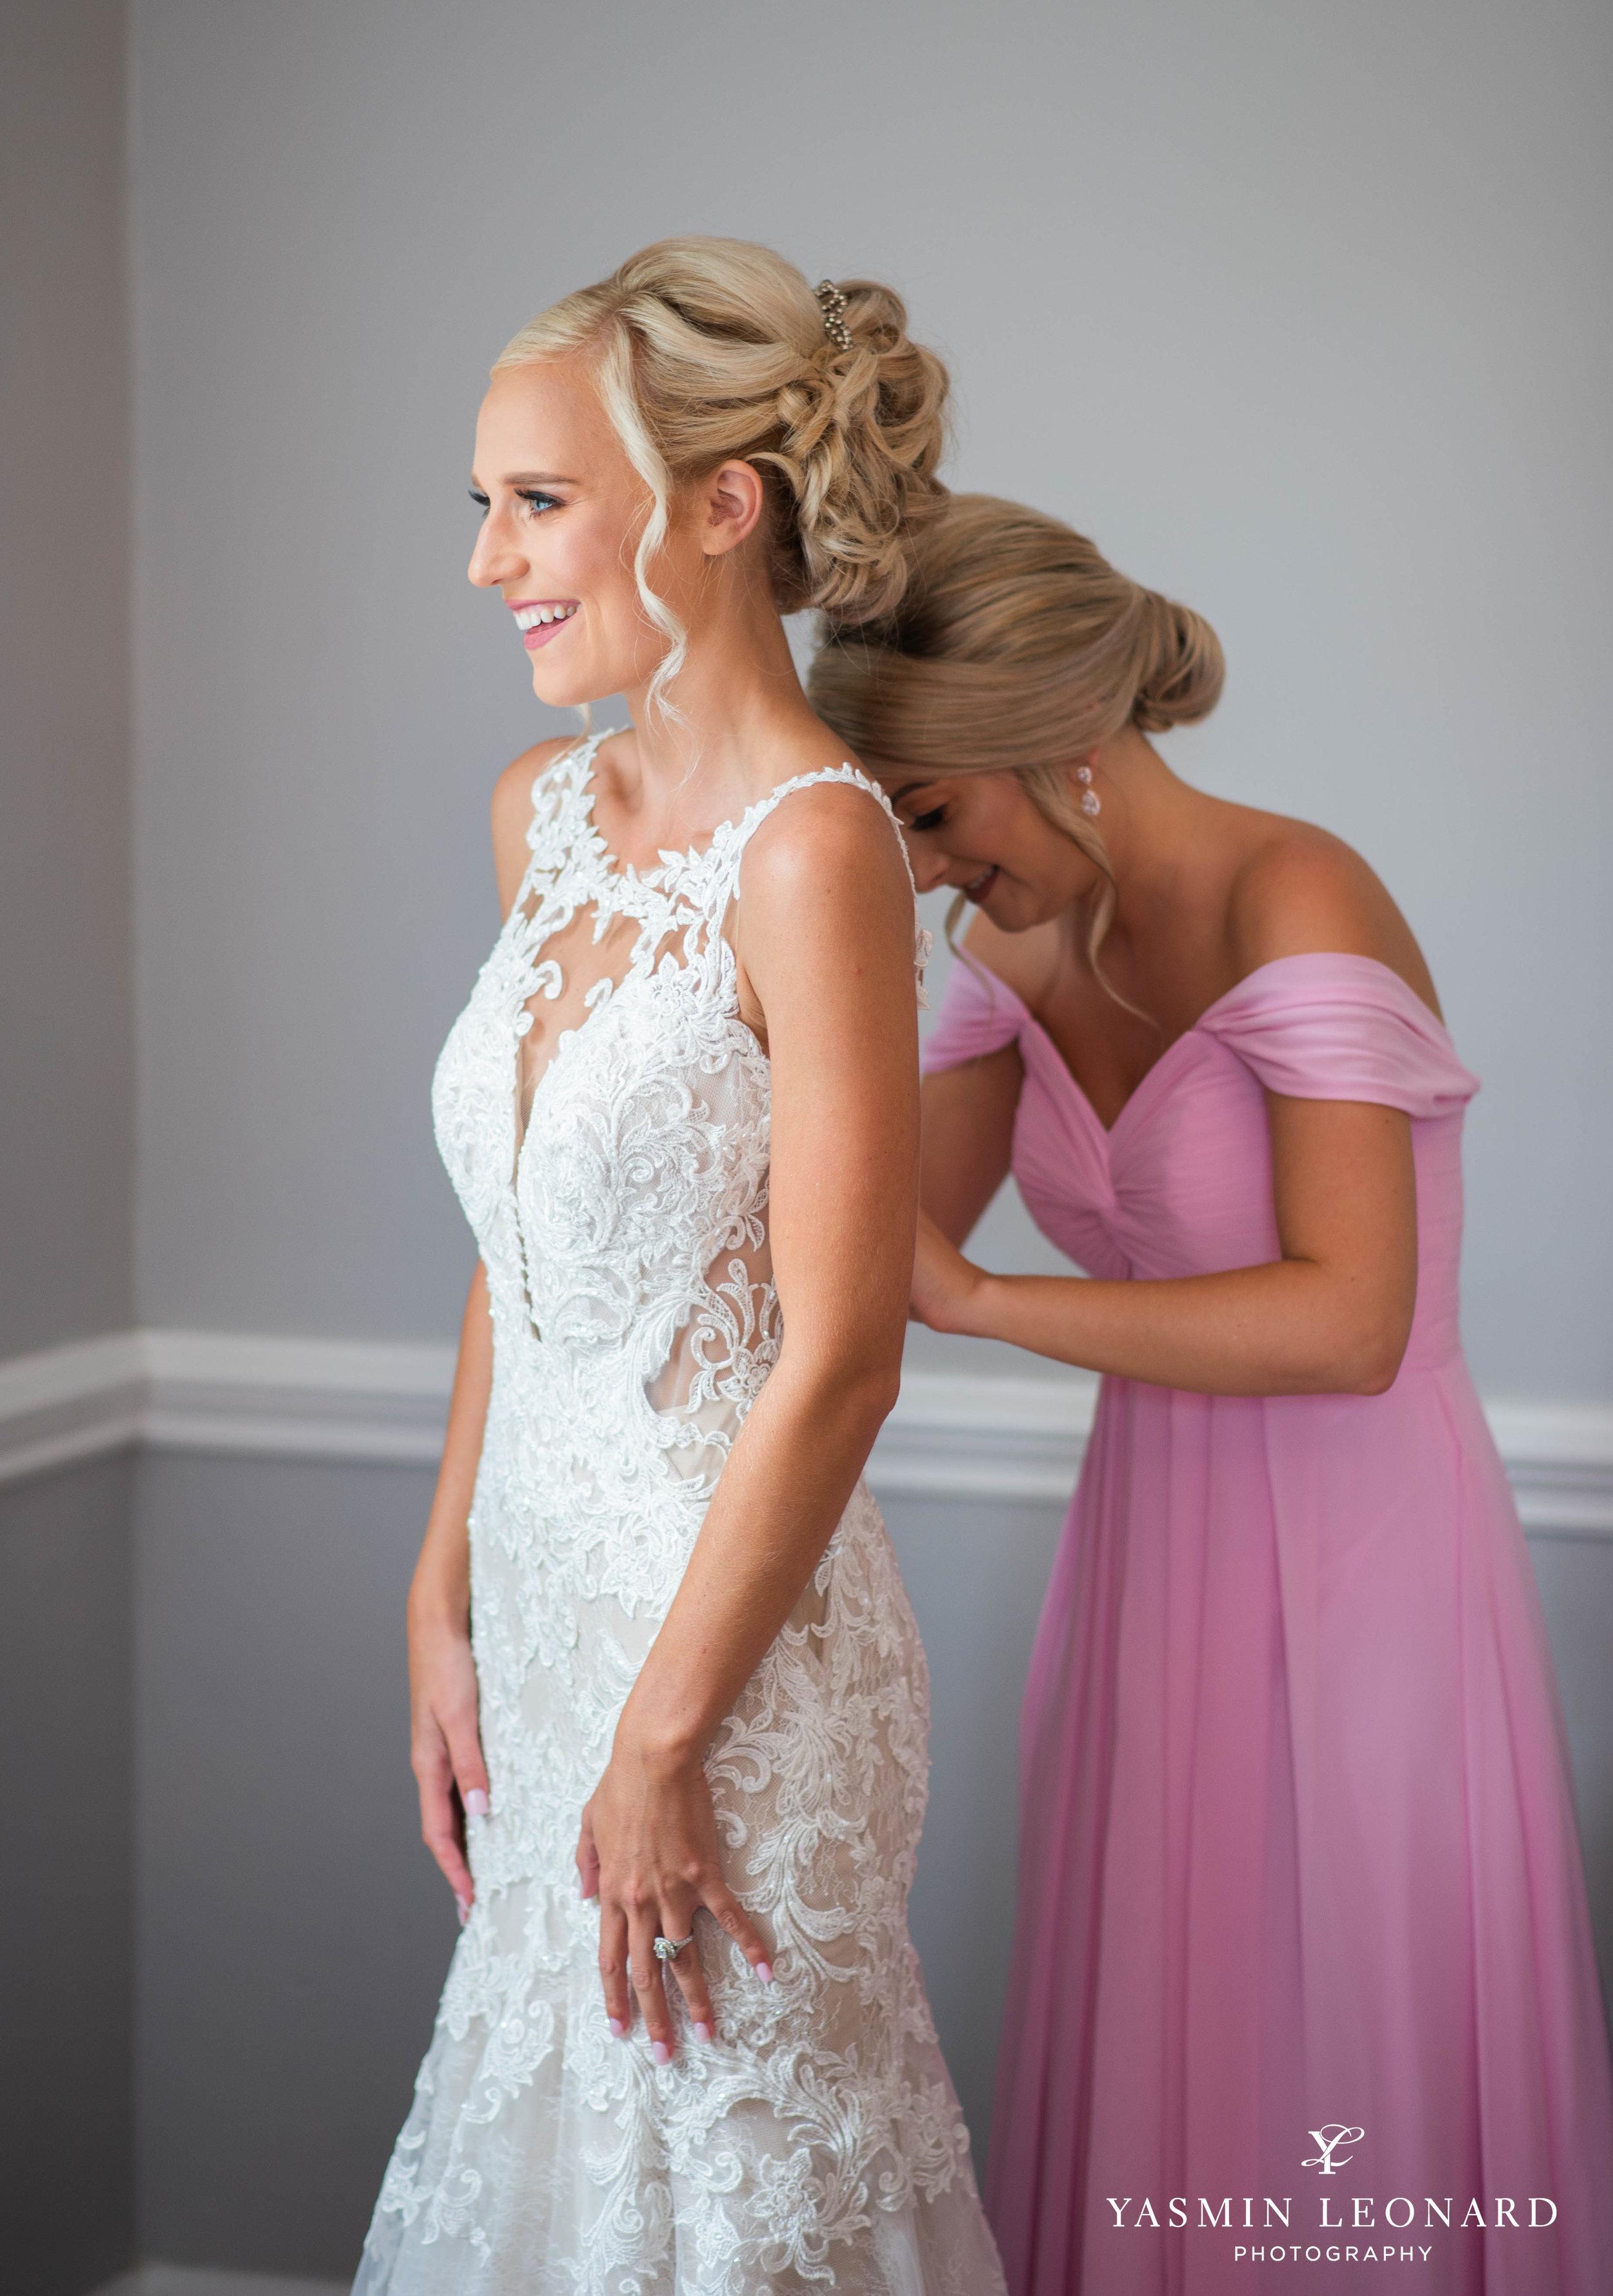 Separk Mansion - NC Weddings - Gastonia Wedding - NC Wedding Venues - Pink and Blue Wedding Ideas - Pink Bridesmaid Dresses - Yasmin Leonard Photography-8.jpg